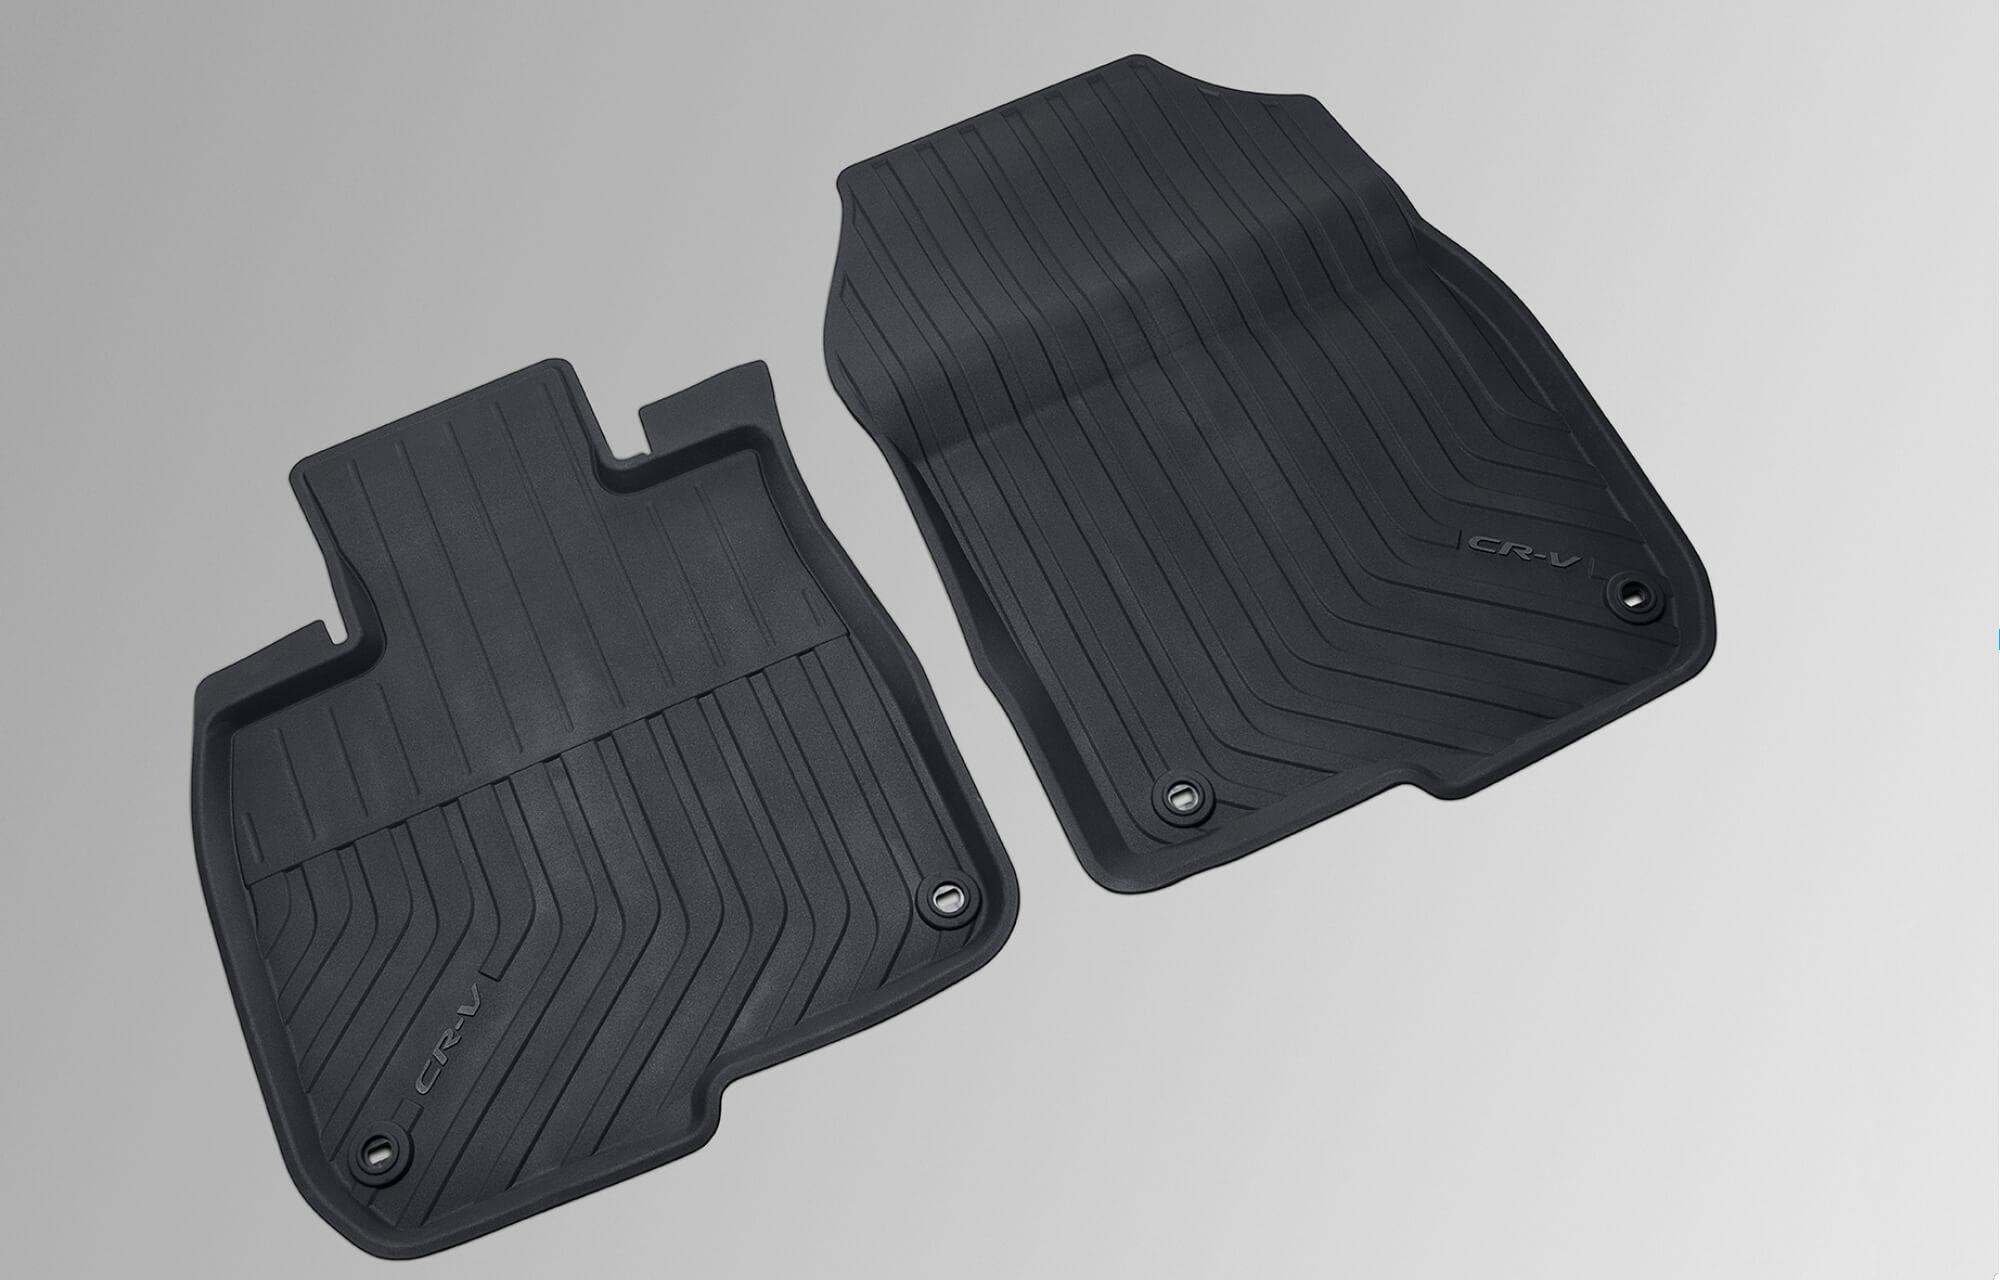 CR-V Rear Lipped Rubber Mats